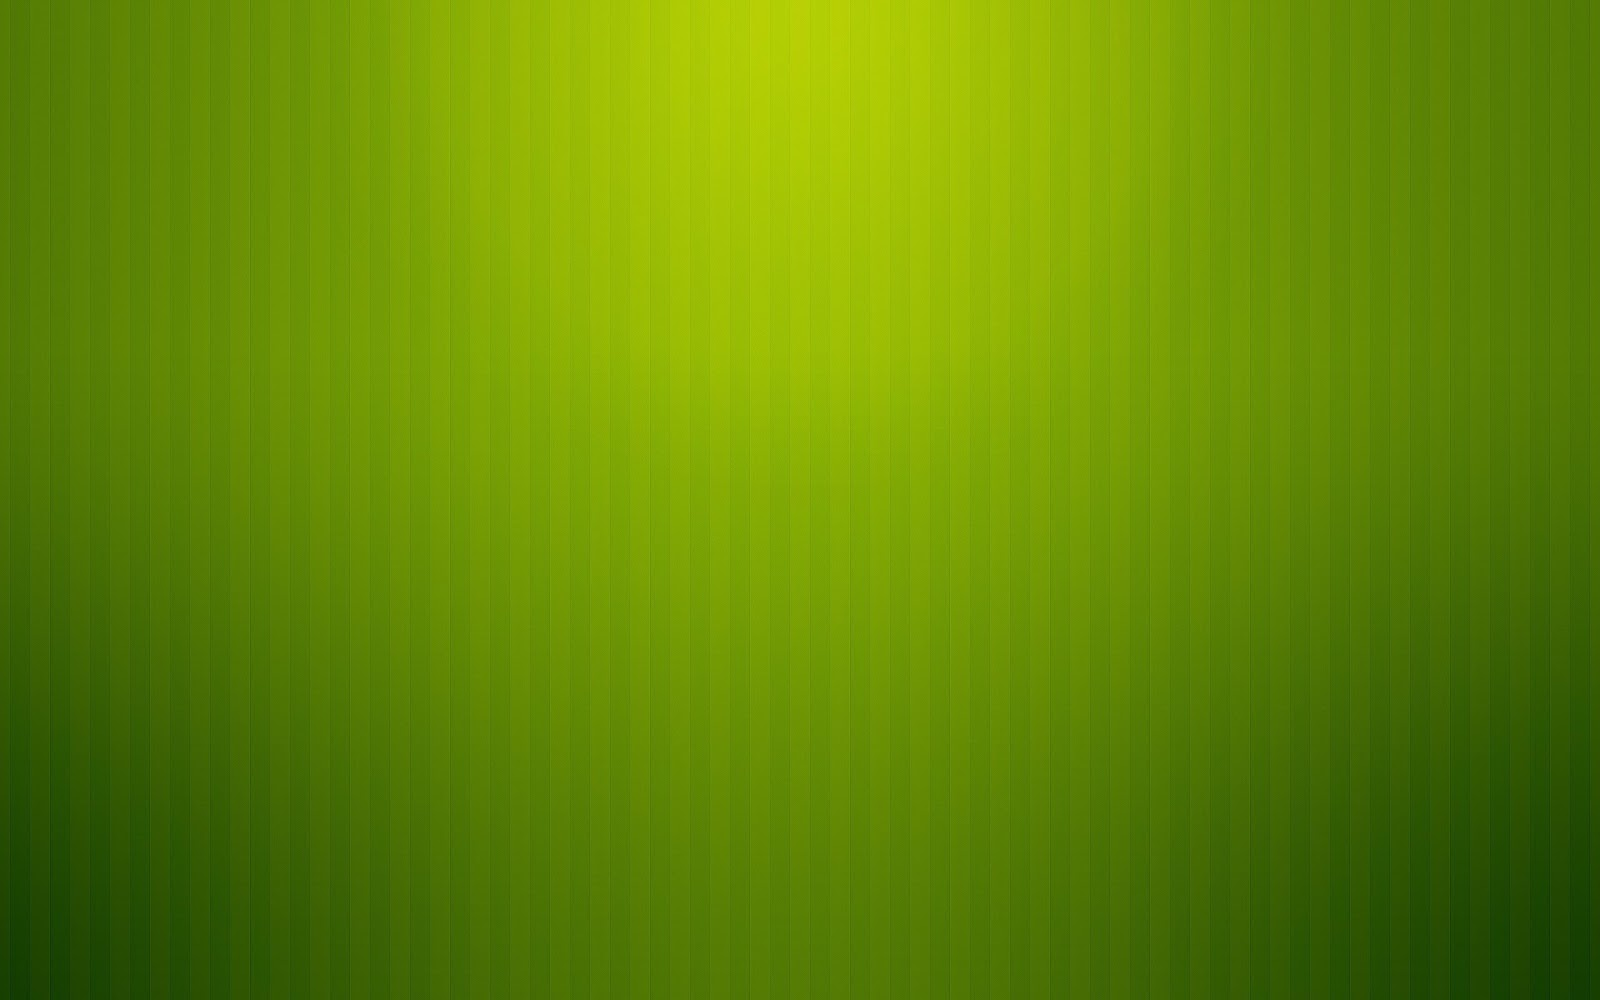 HD Wallpapers Desktop Simple Plain HD DeskTop Wallpapers 1600x1000